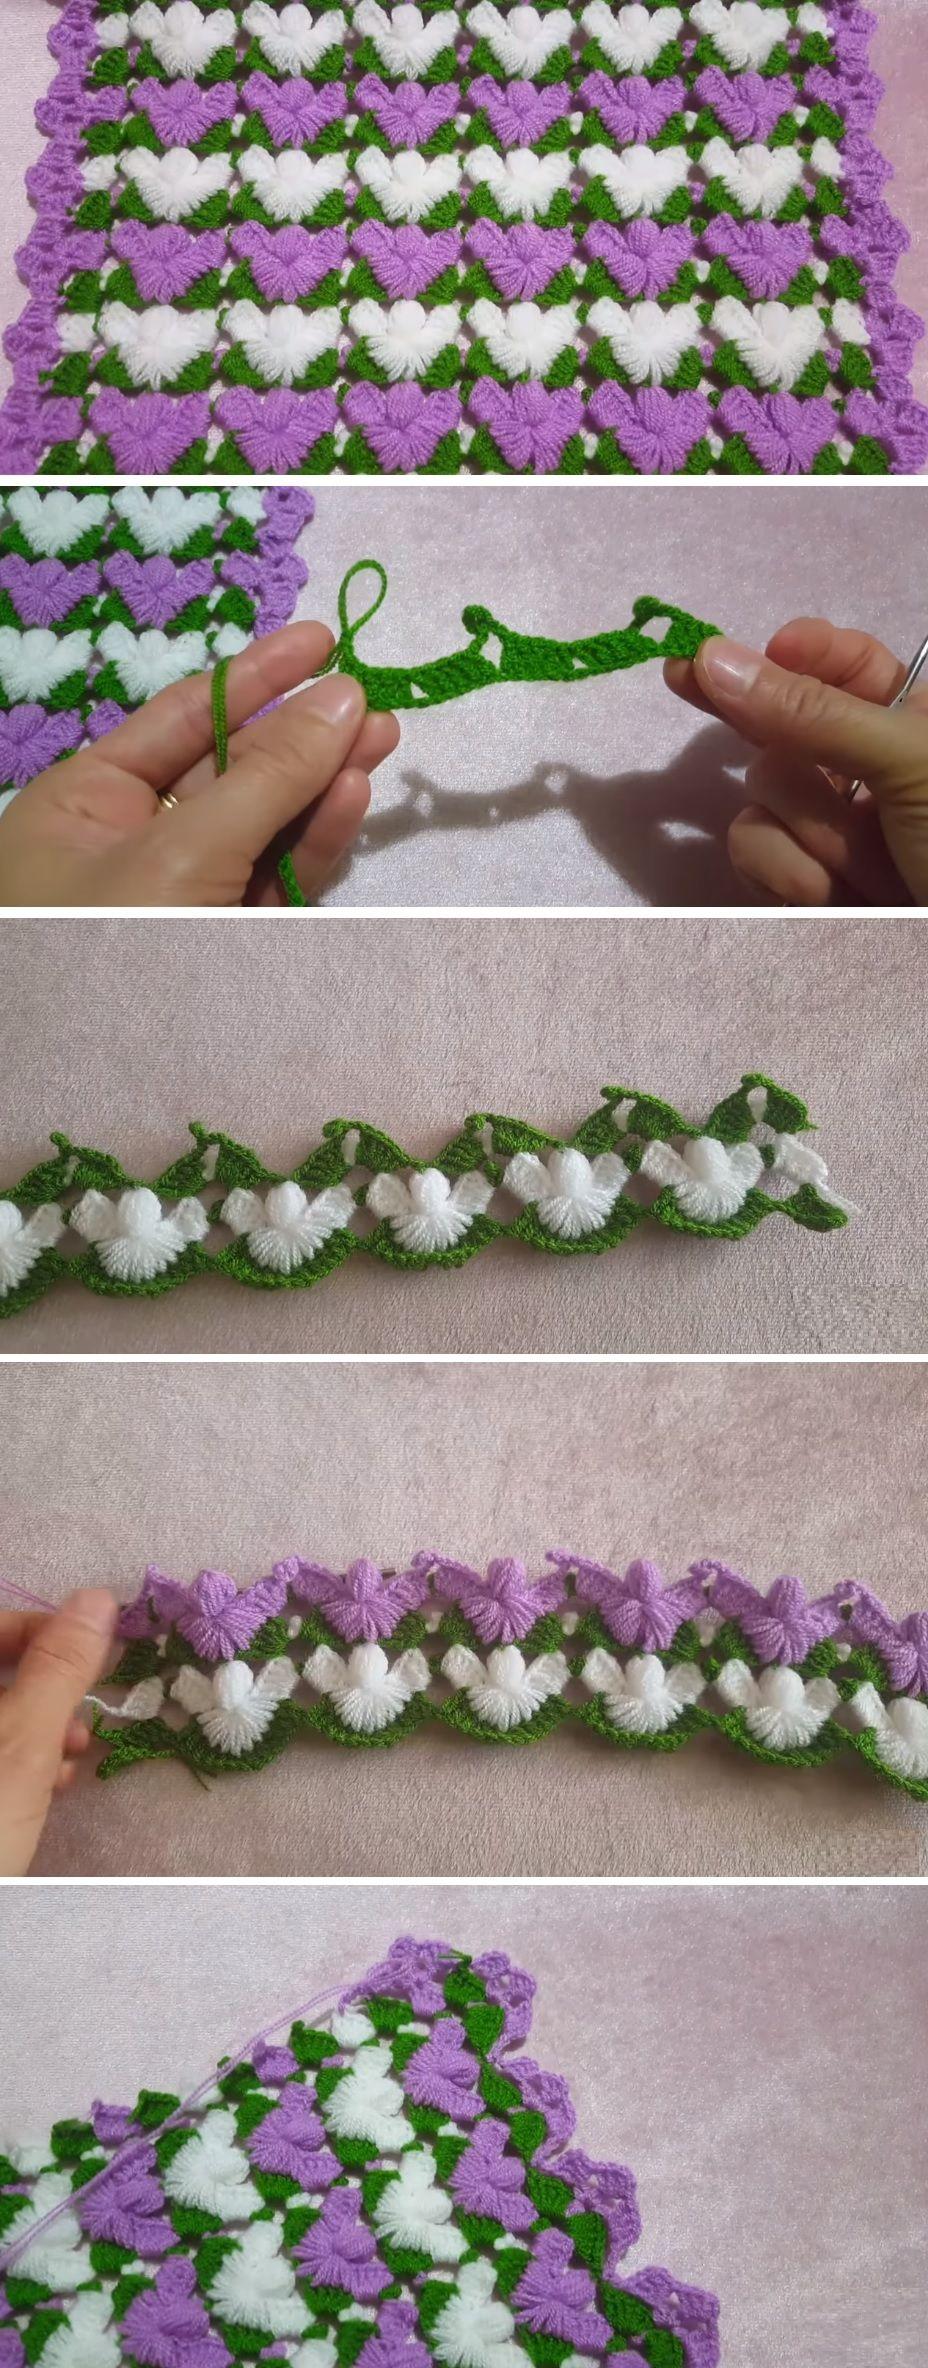 Crochet Tutorial – Beautiful Wing-Like Stitch to Make | Häkelmuster ...